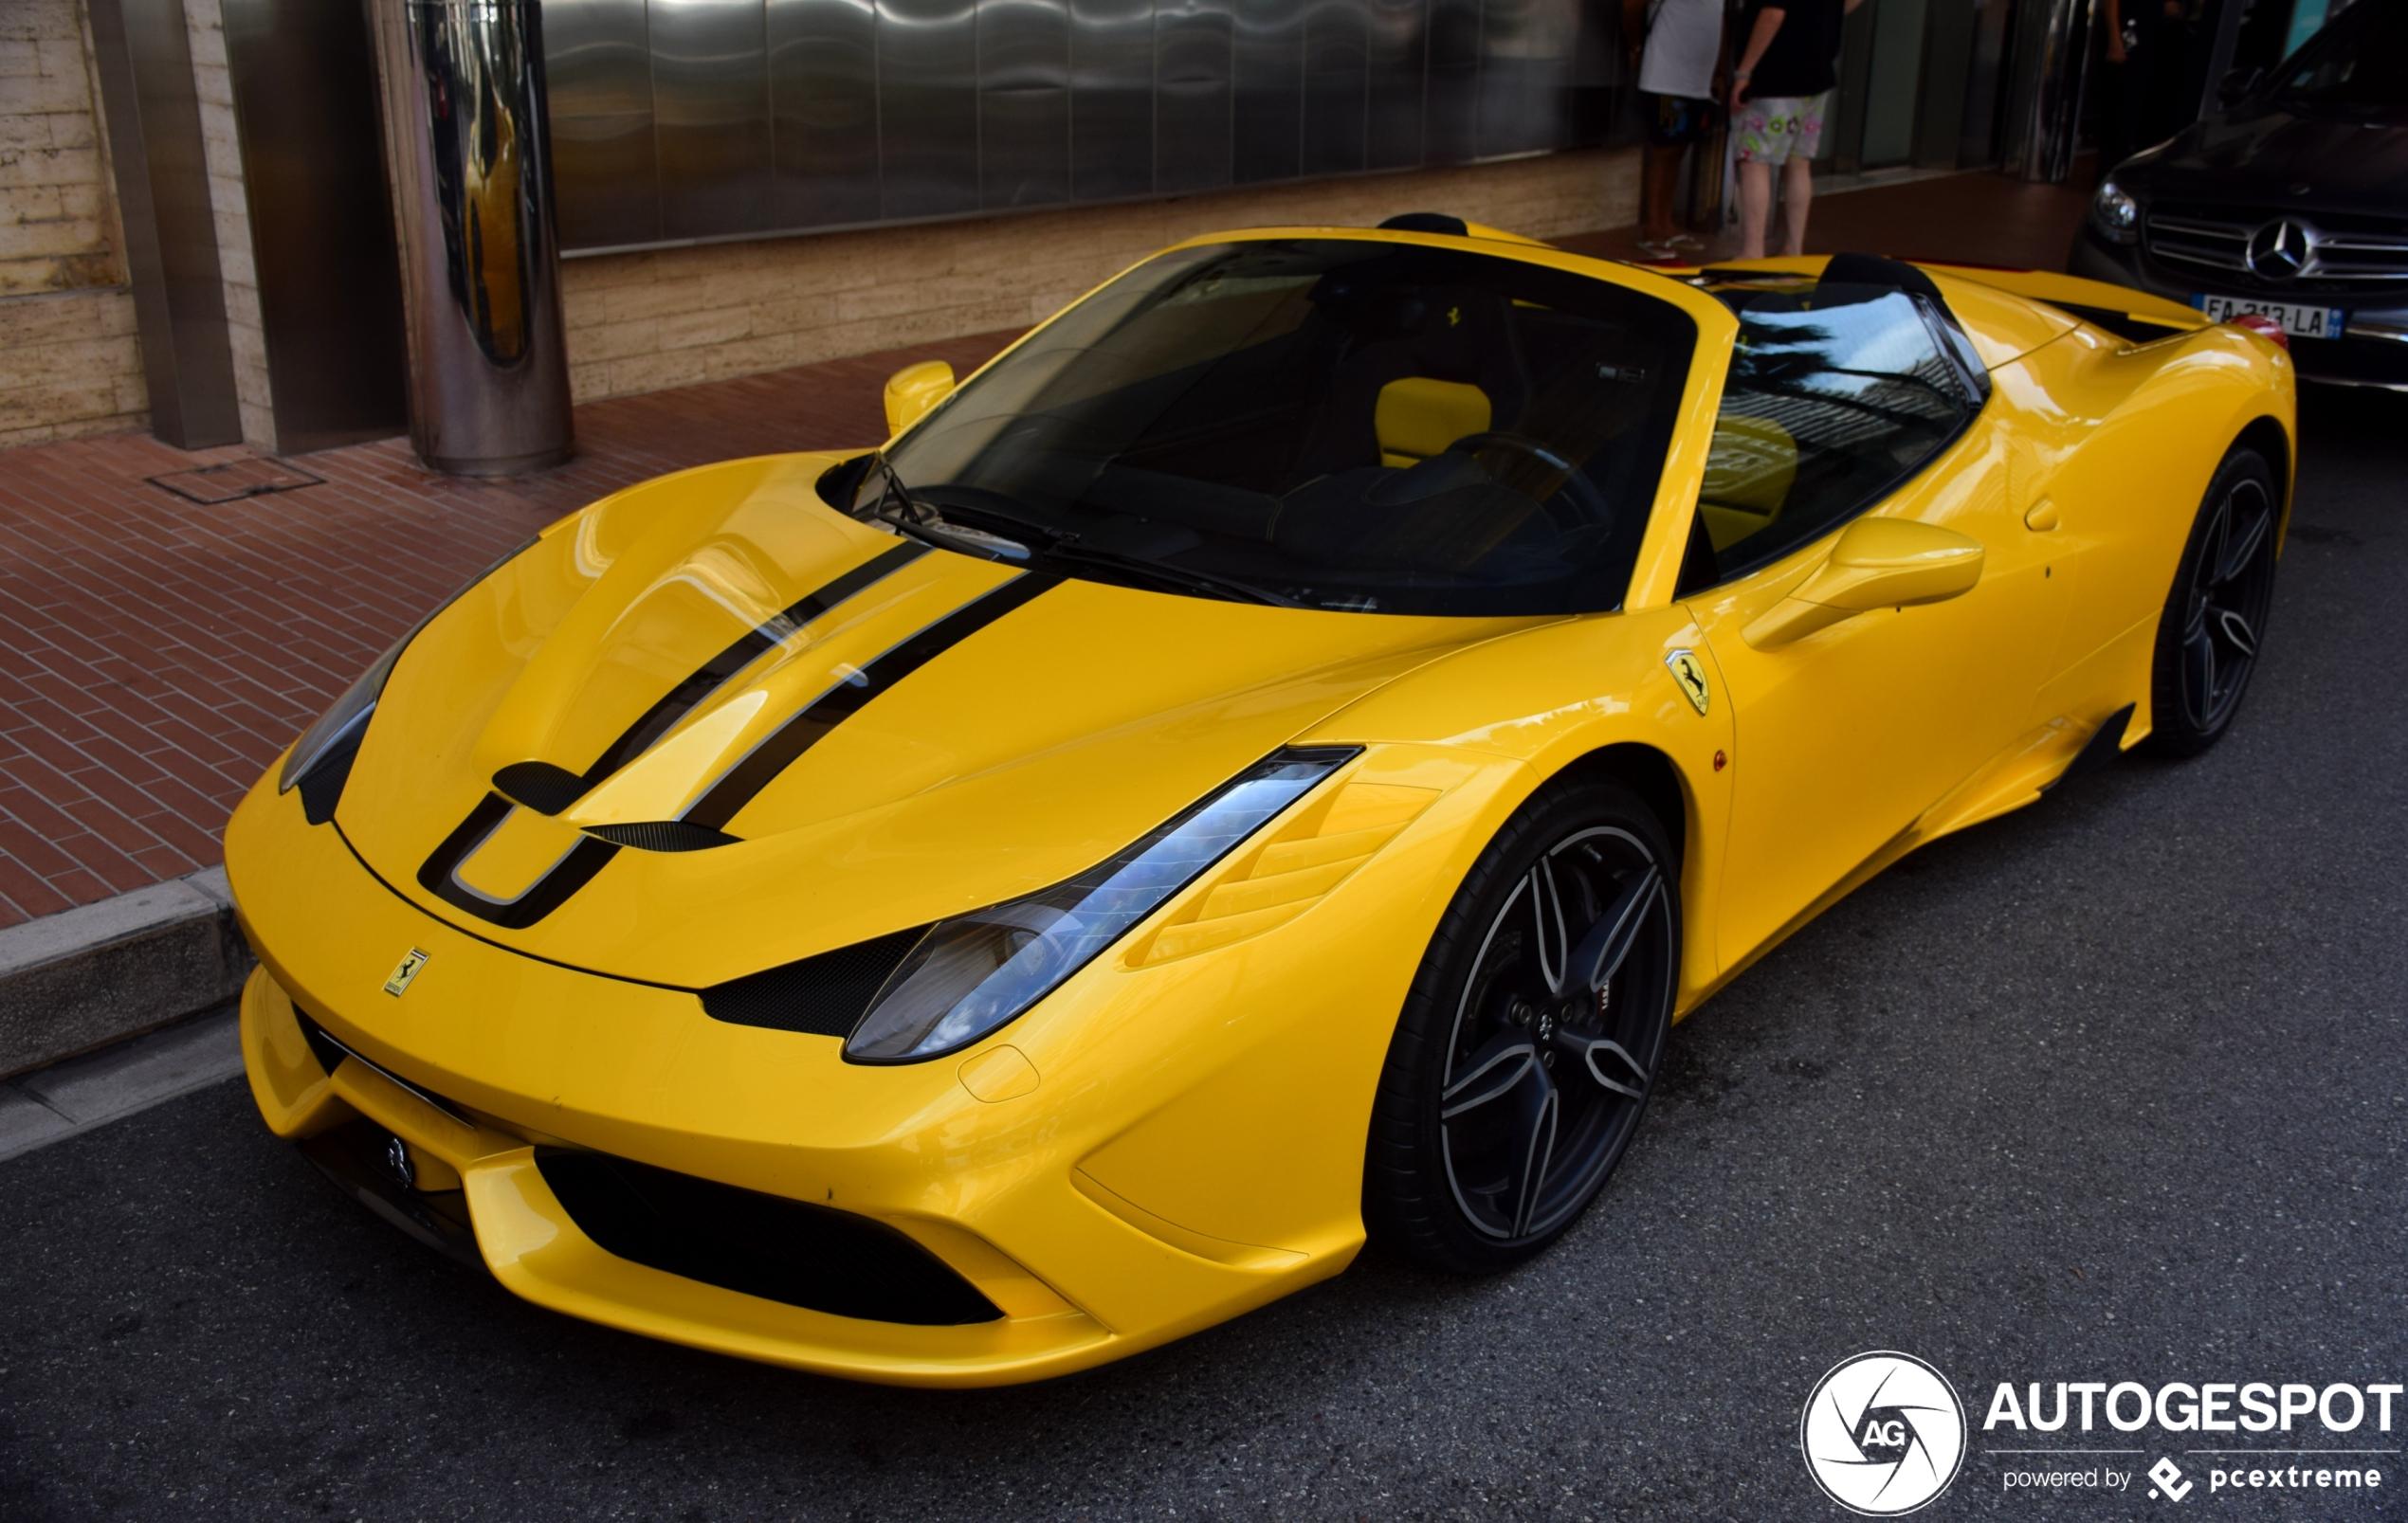 Ferrari 458 Speciale A 17 April 2020 Autogespot